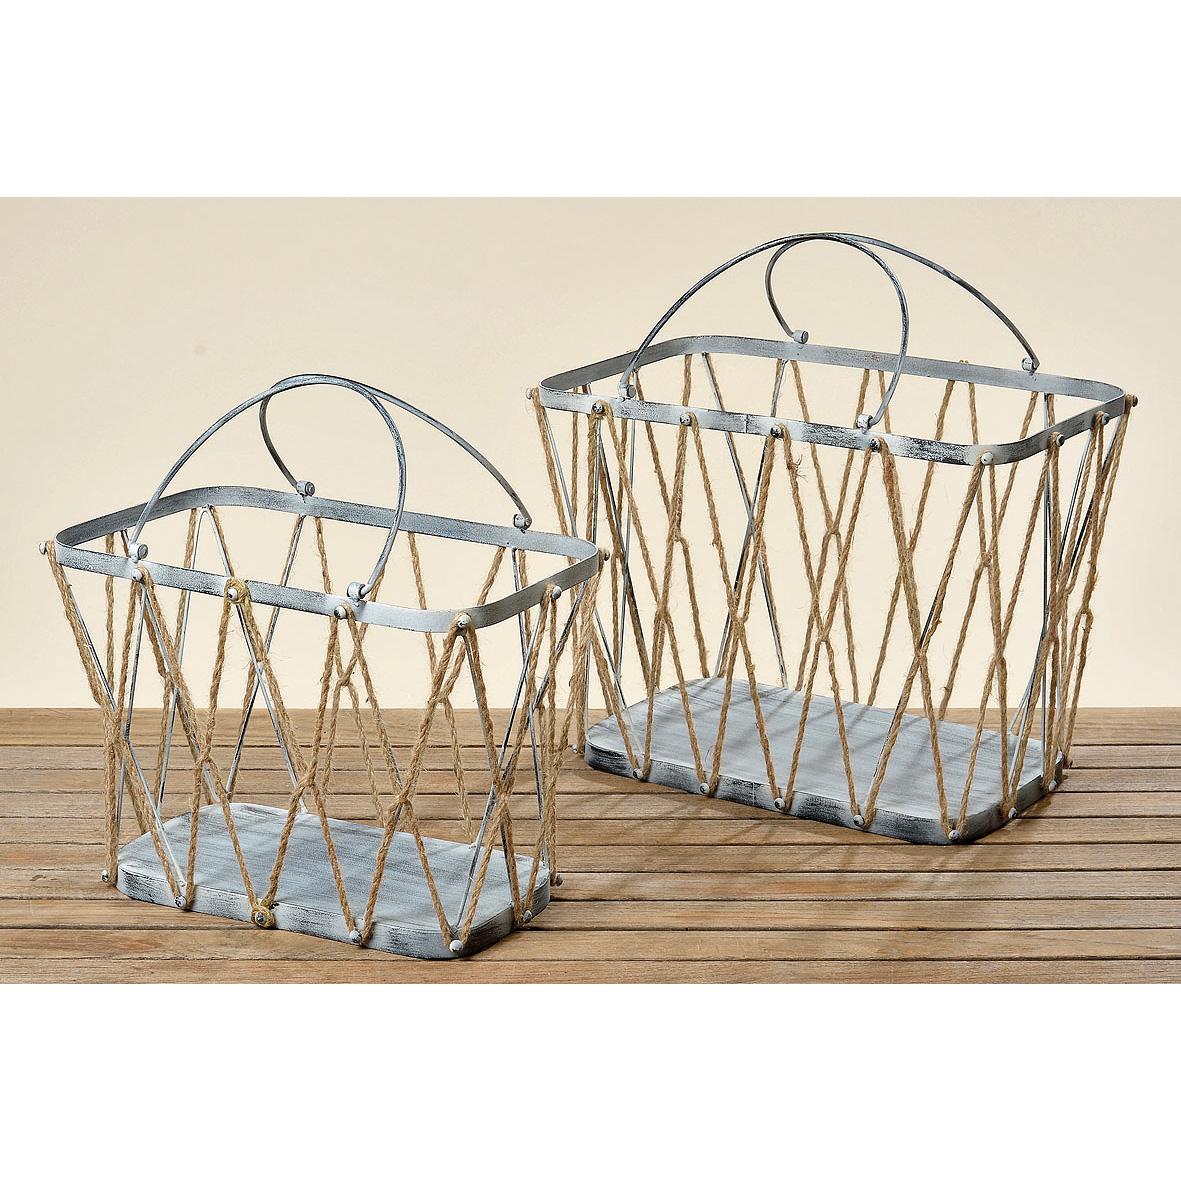 korb aus metall mit hanfseilen eckig 42cm 028869. Black Bedroom Furniture Sets. Home Design Ideas